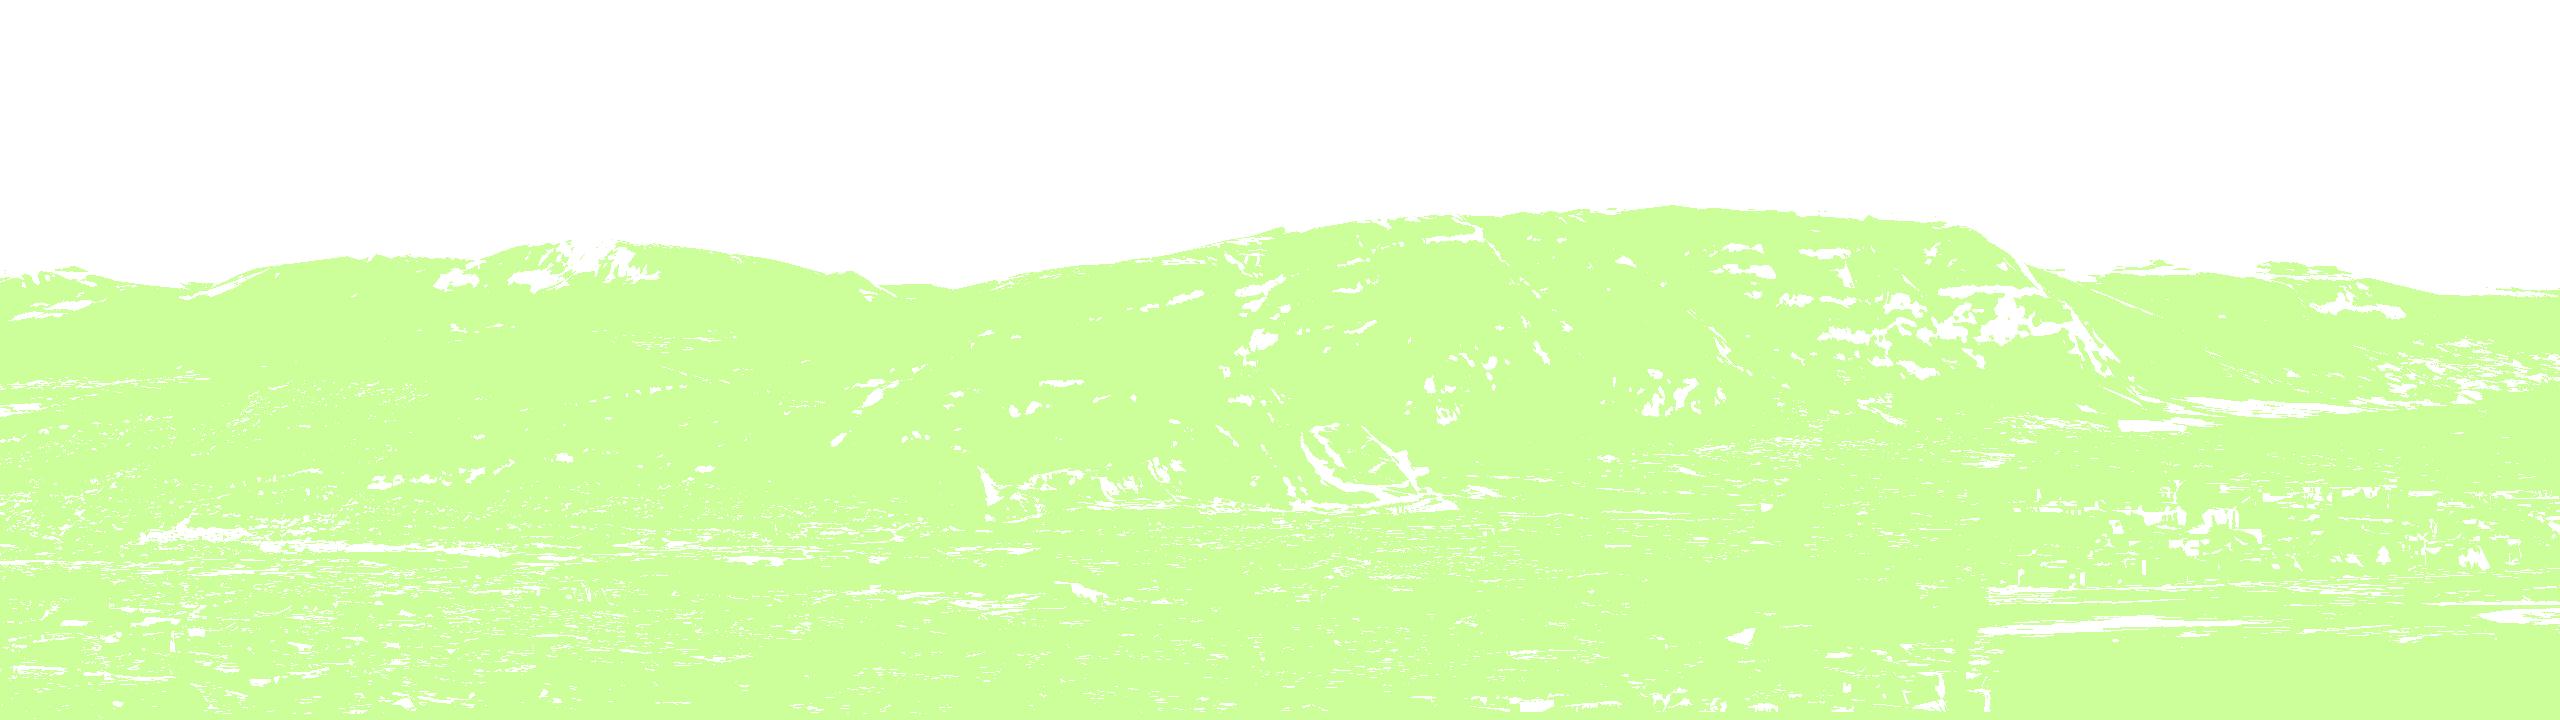 promenade_8